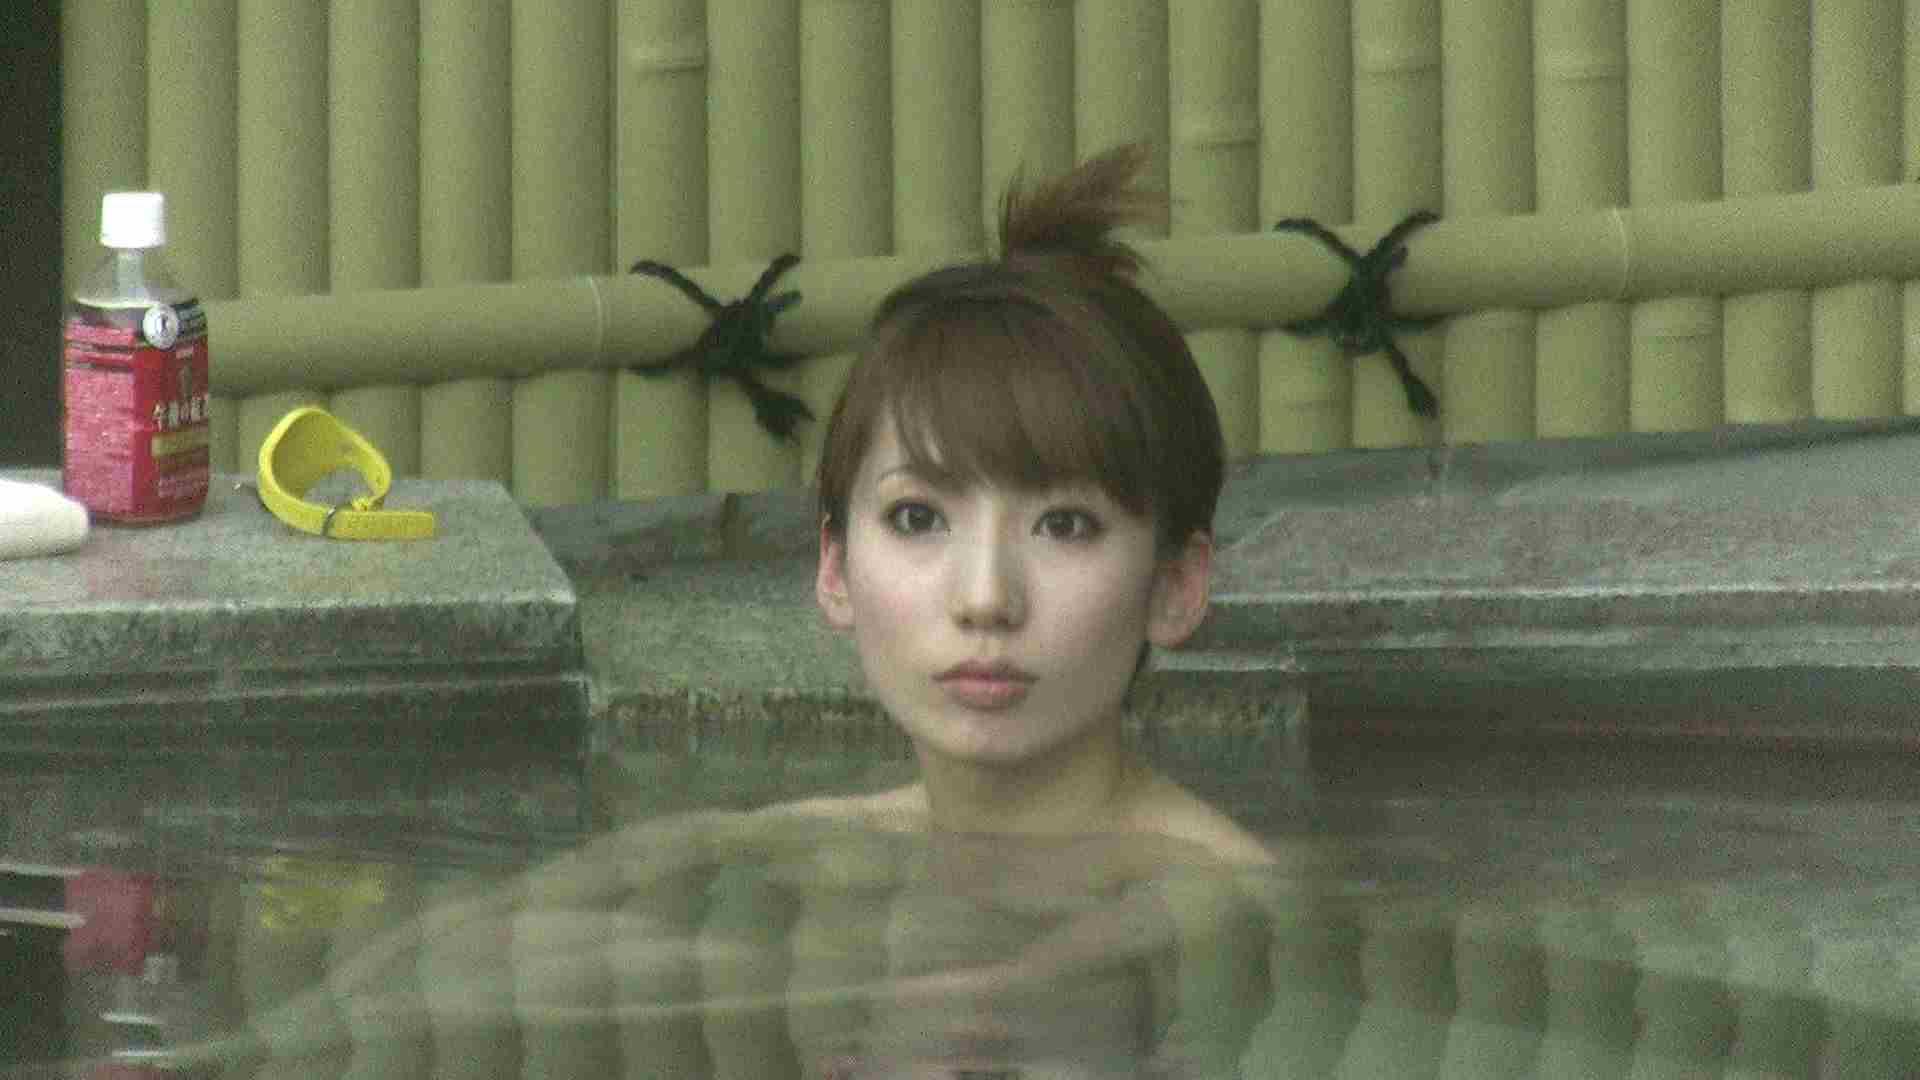 Aquaな露天風呂Vol.208 露天風呂編 | 盗撮シリーズ  103PIX 37